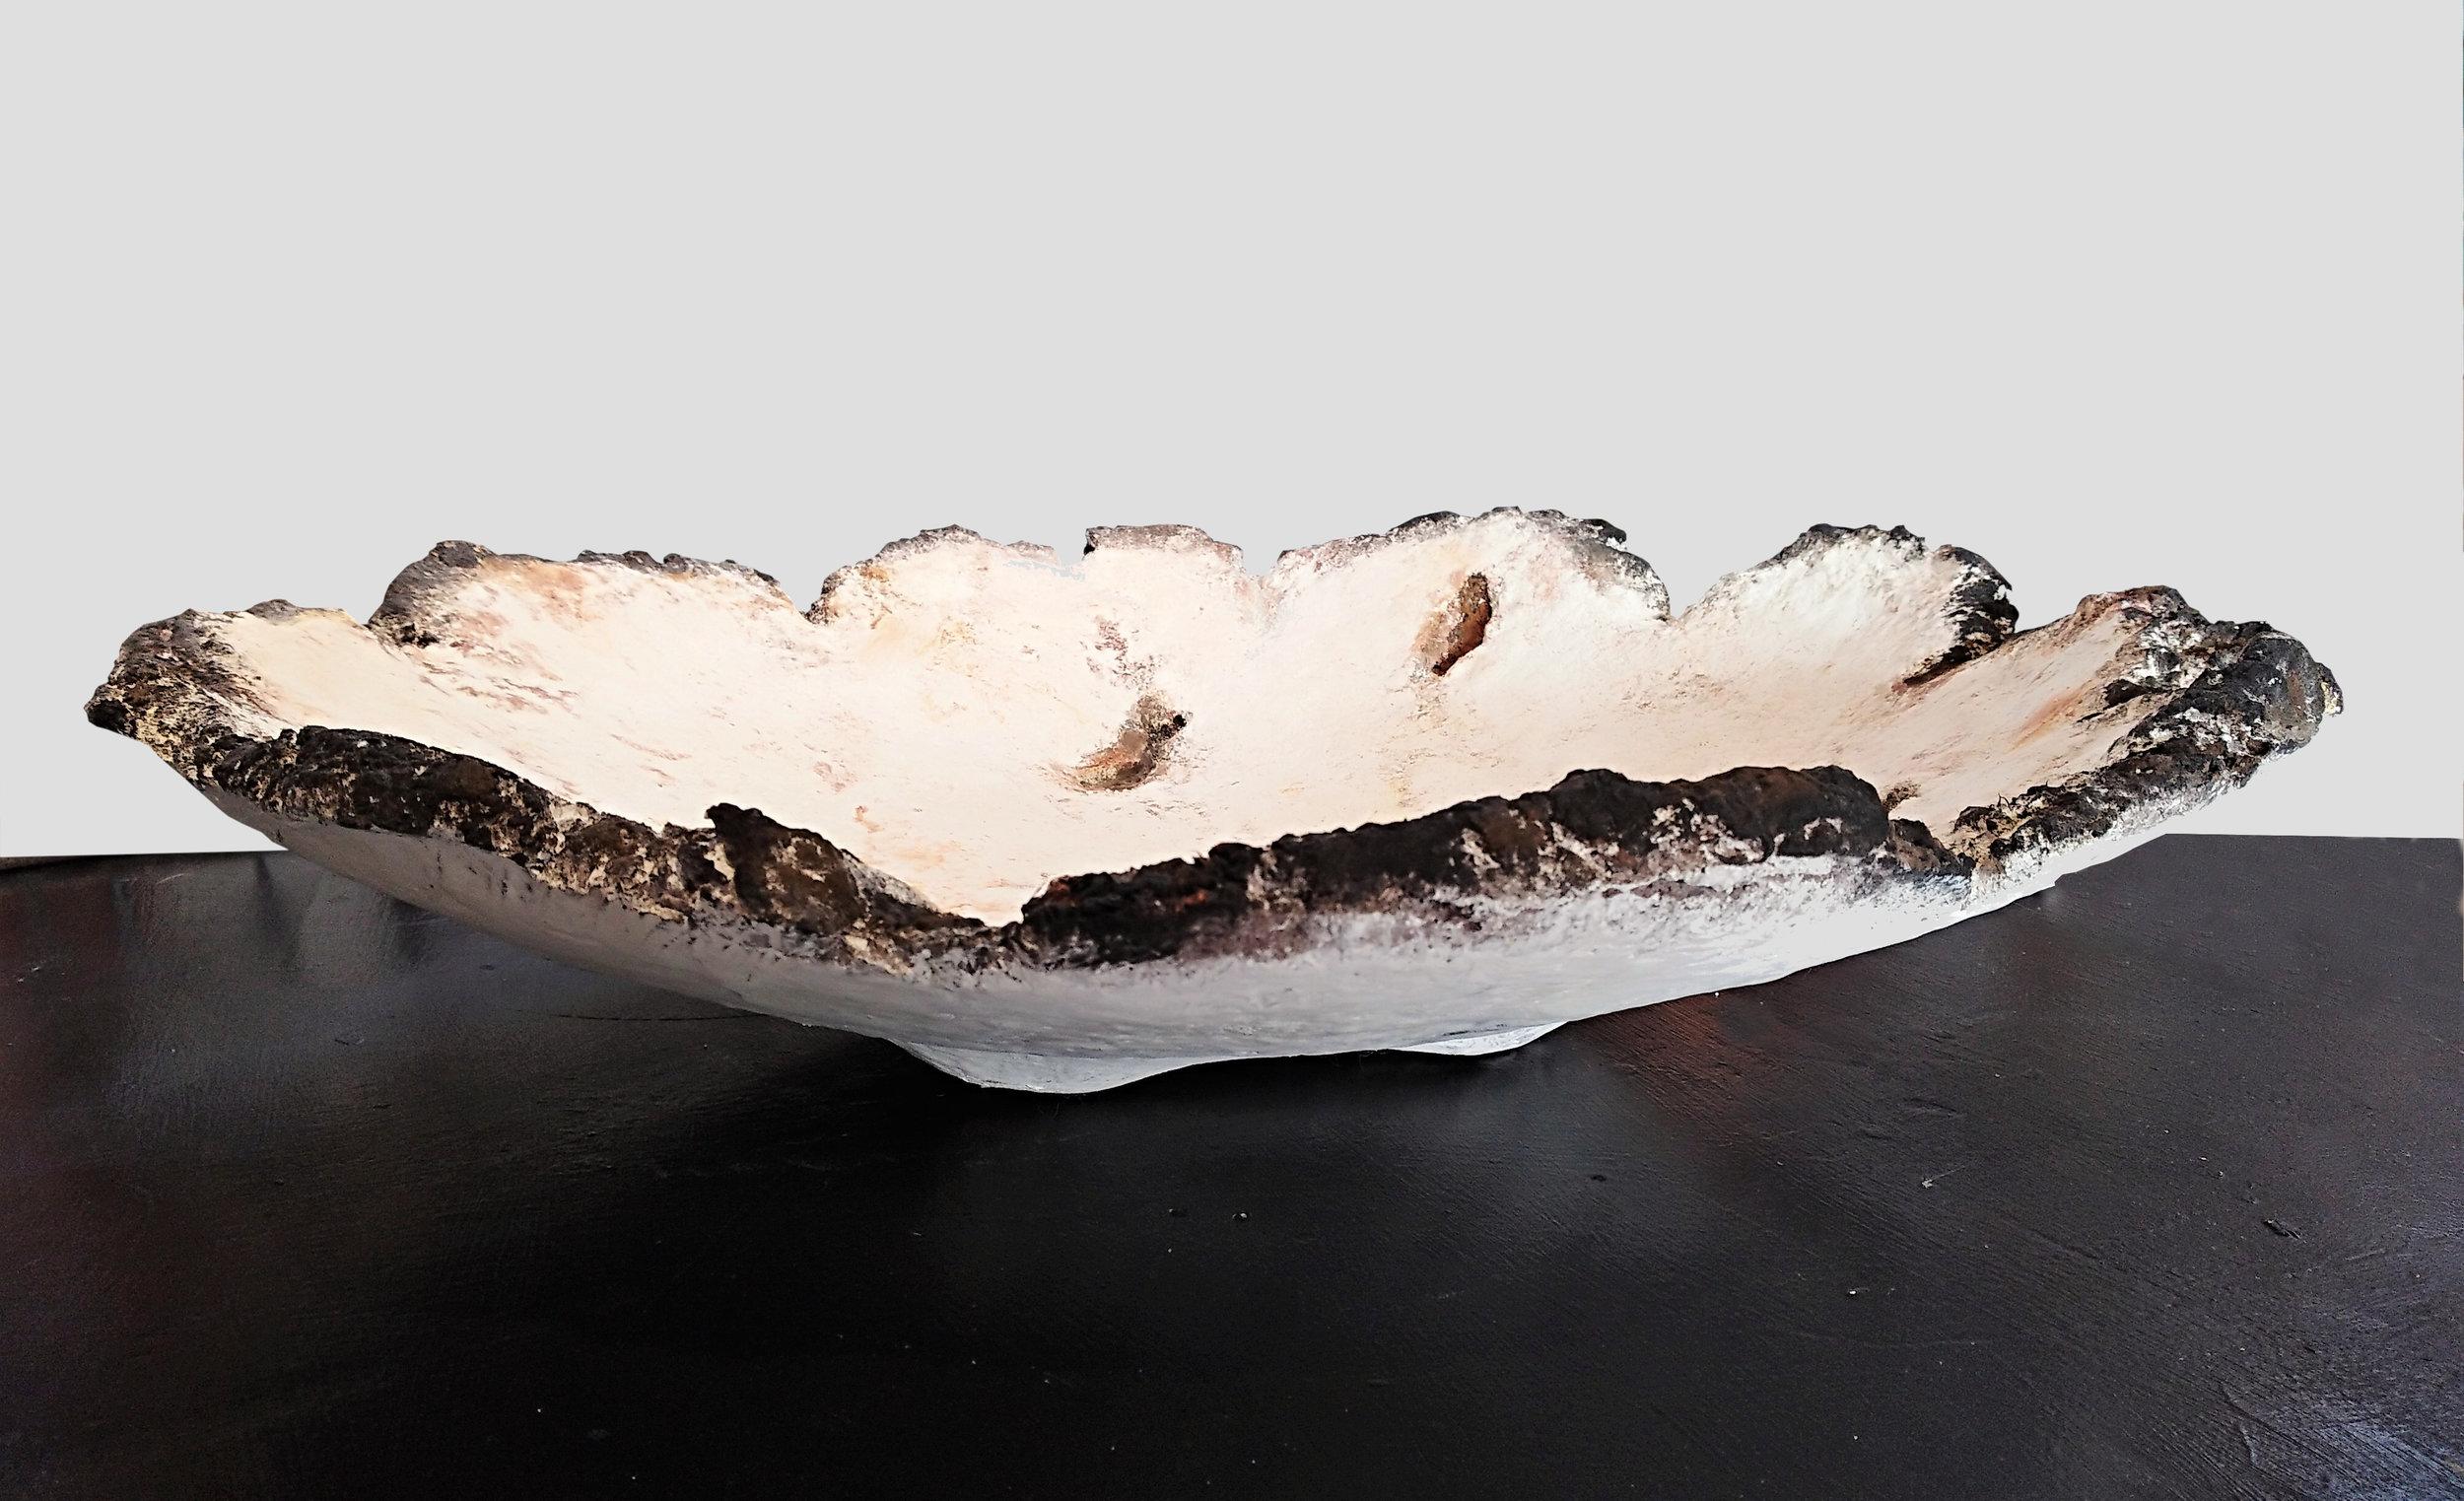 Jagged Crater Vessel  John Phillips, artis fiberclay  $350.00